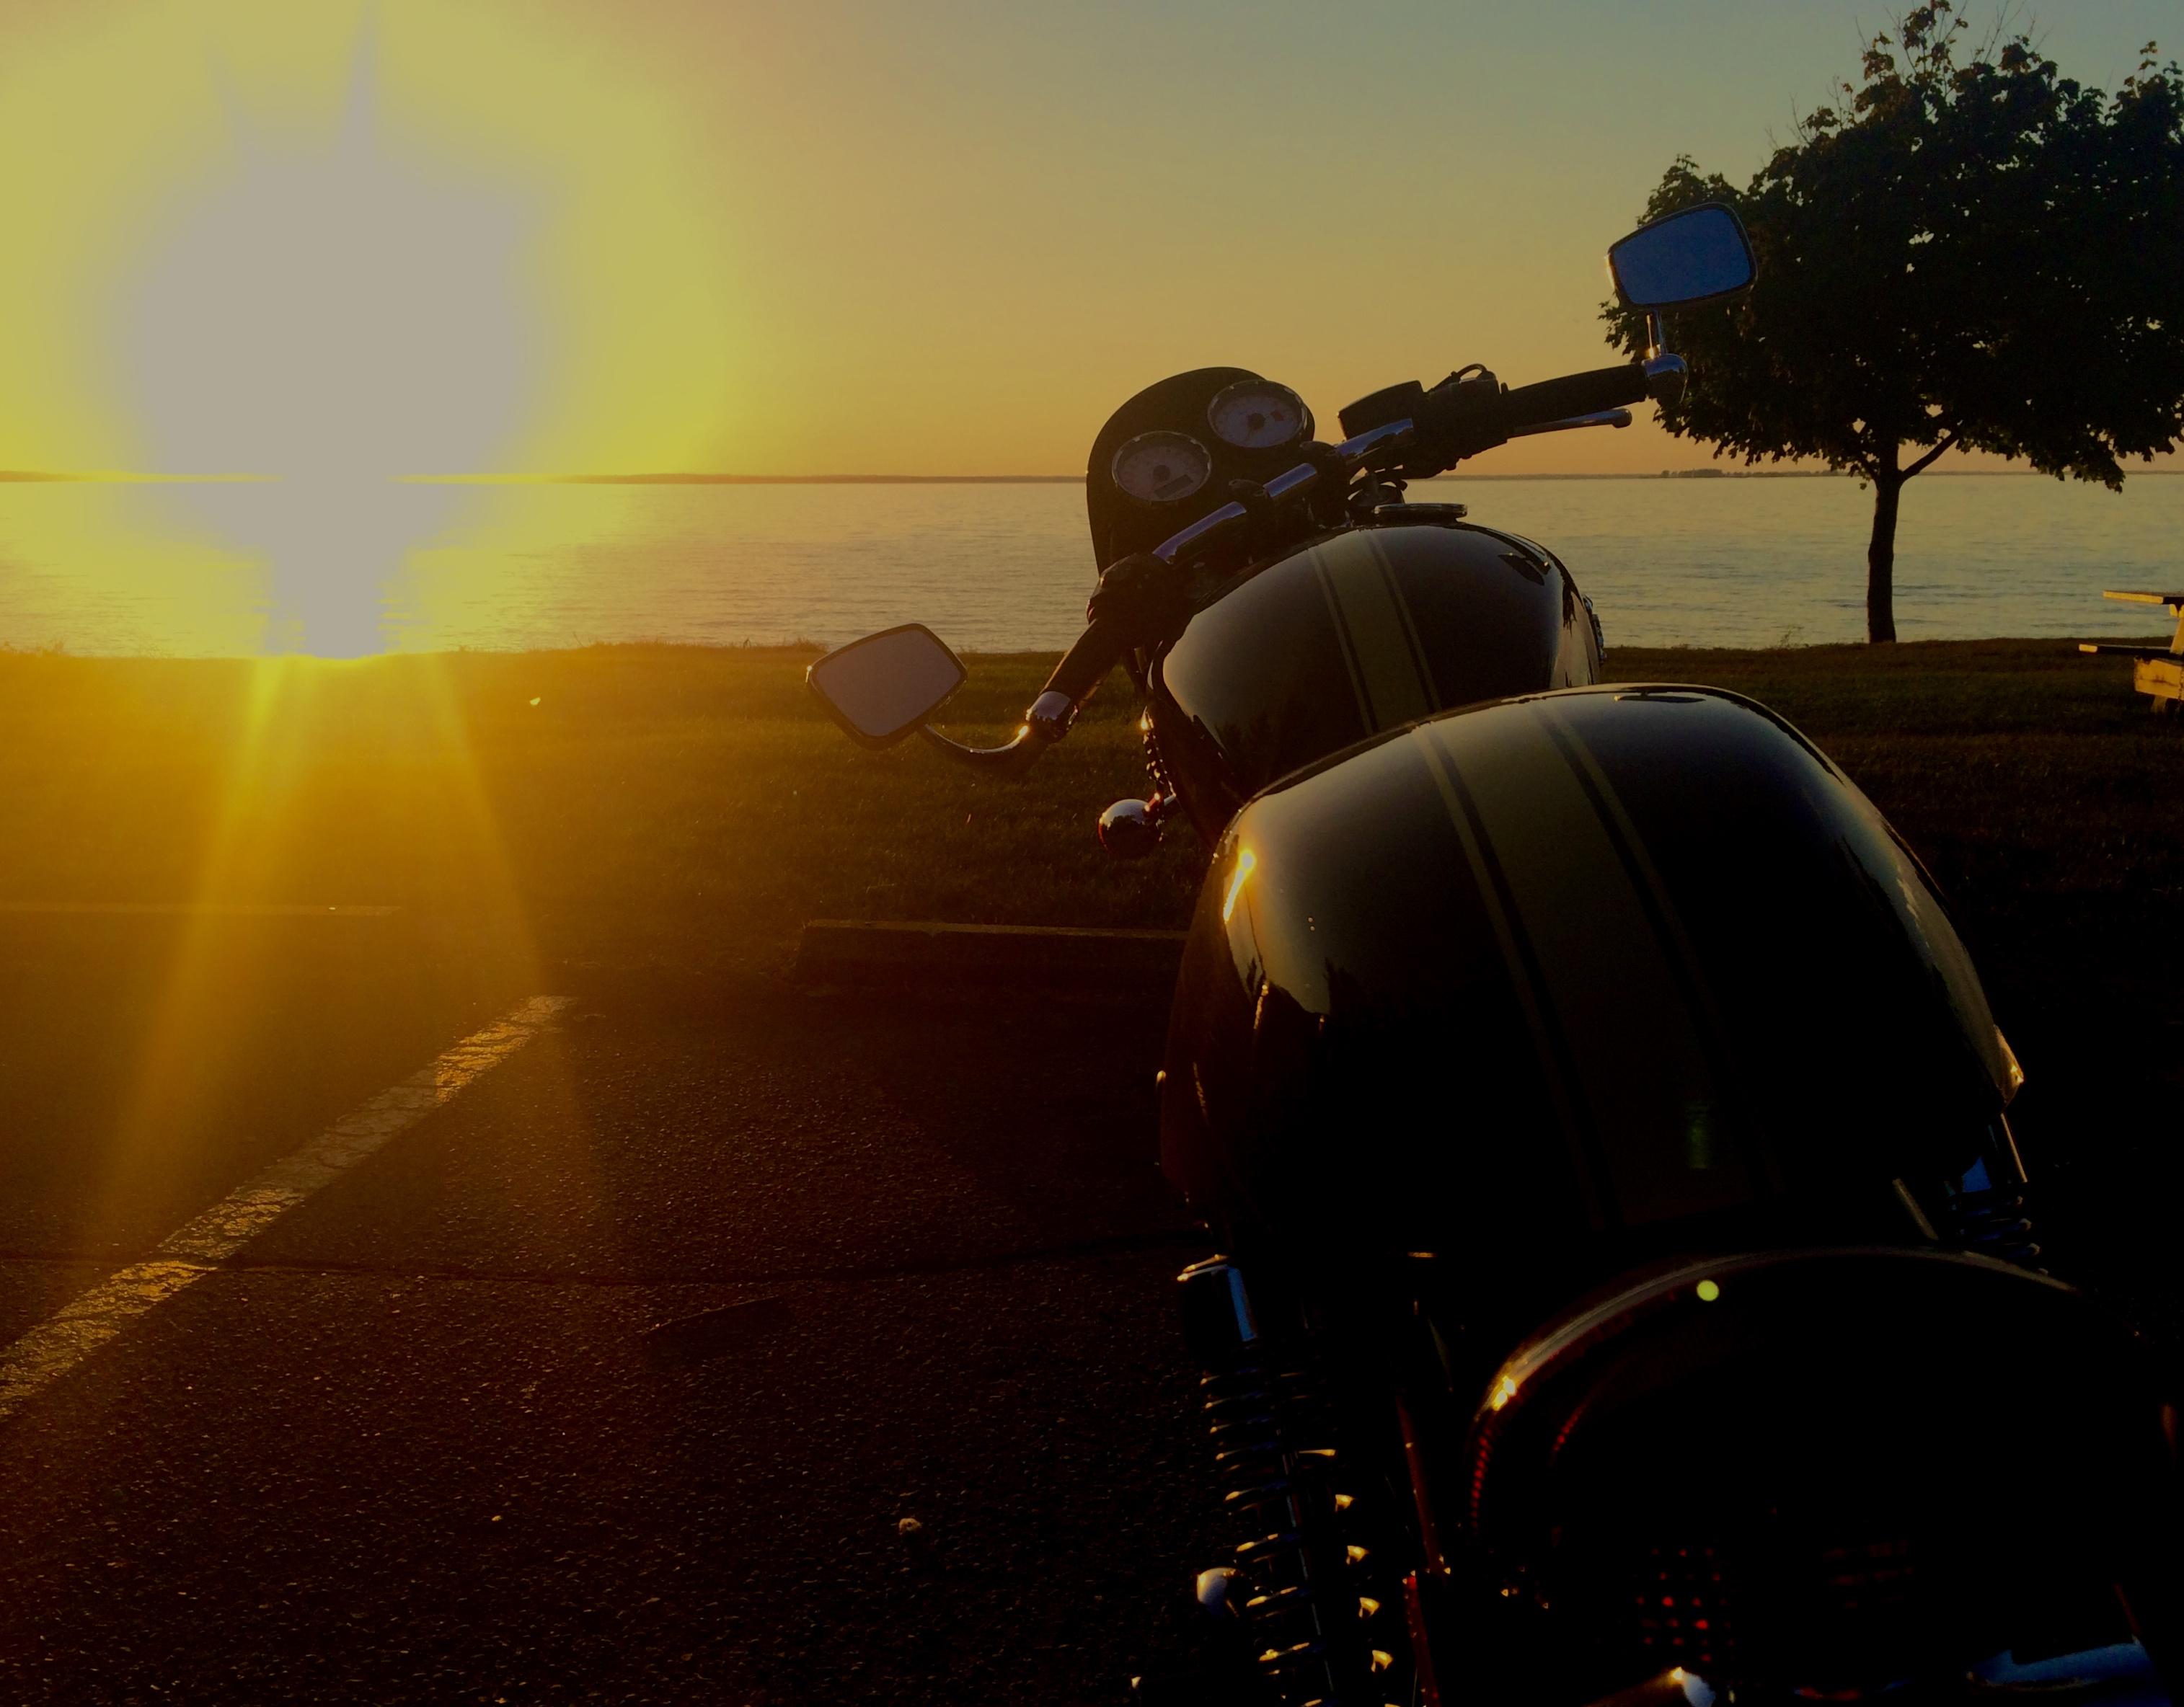 Triumph Thruxton by Green Bay sunset